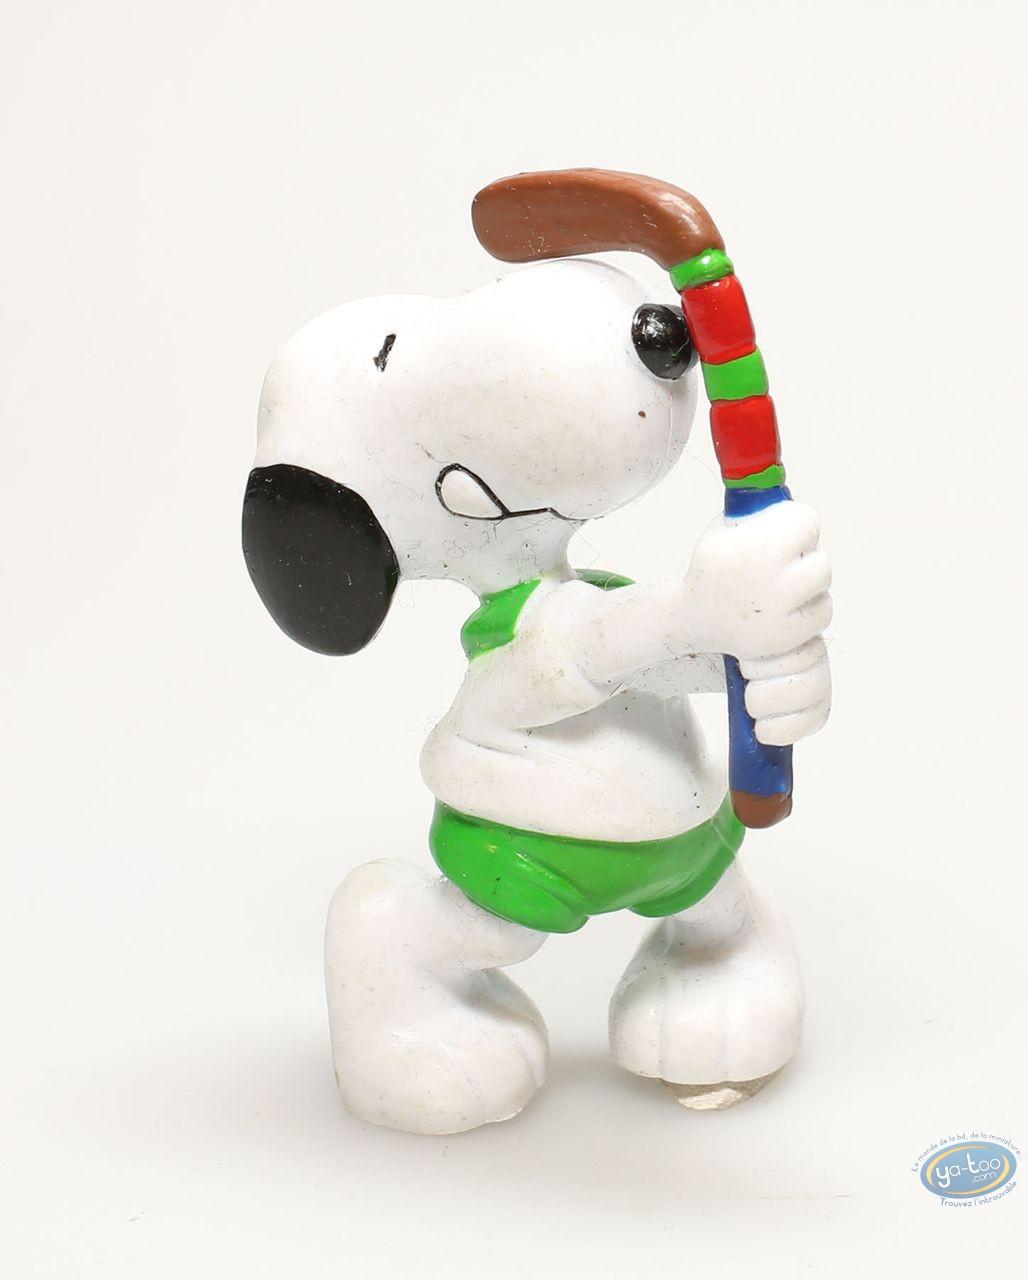 Plastic Figurine, Snoopy : Snoopy butt